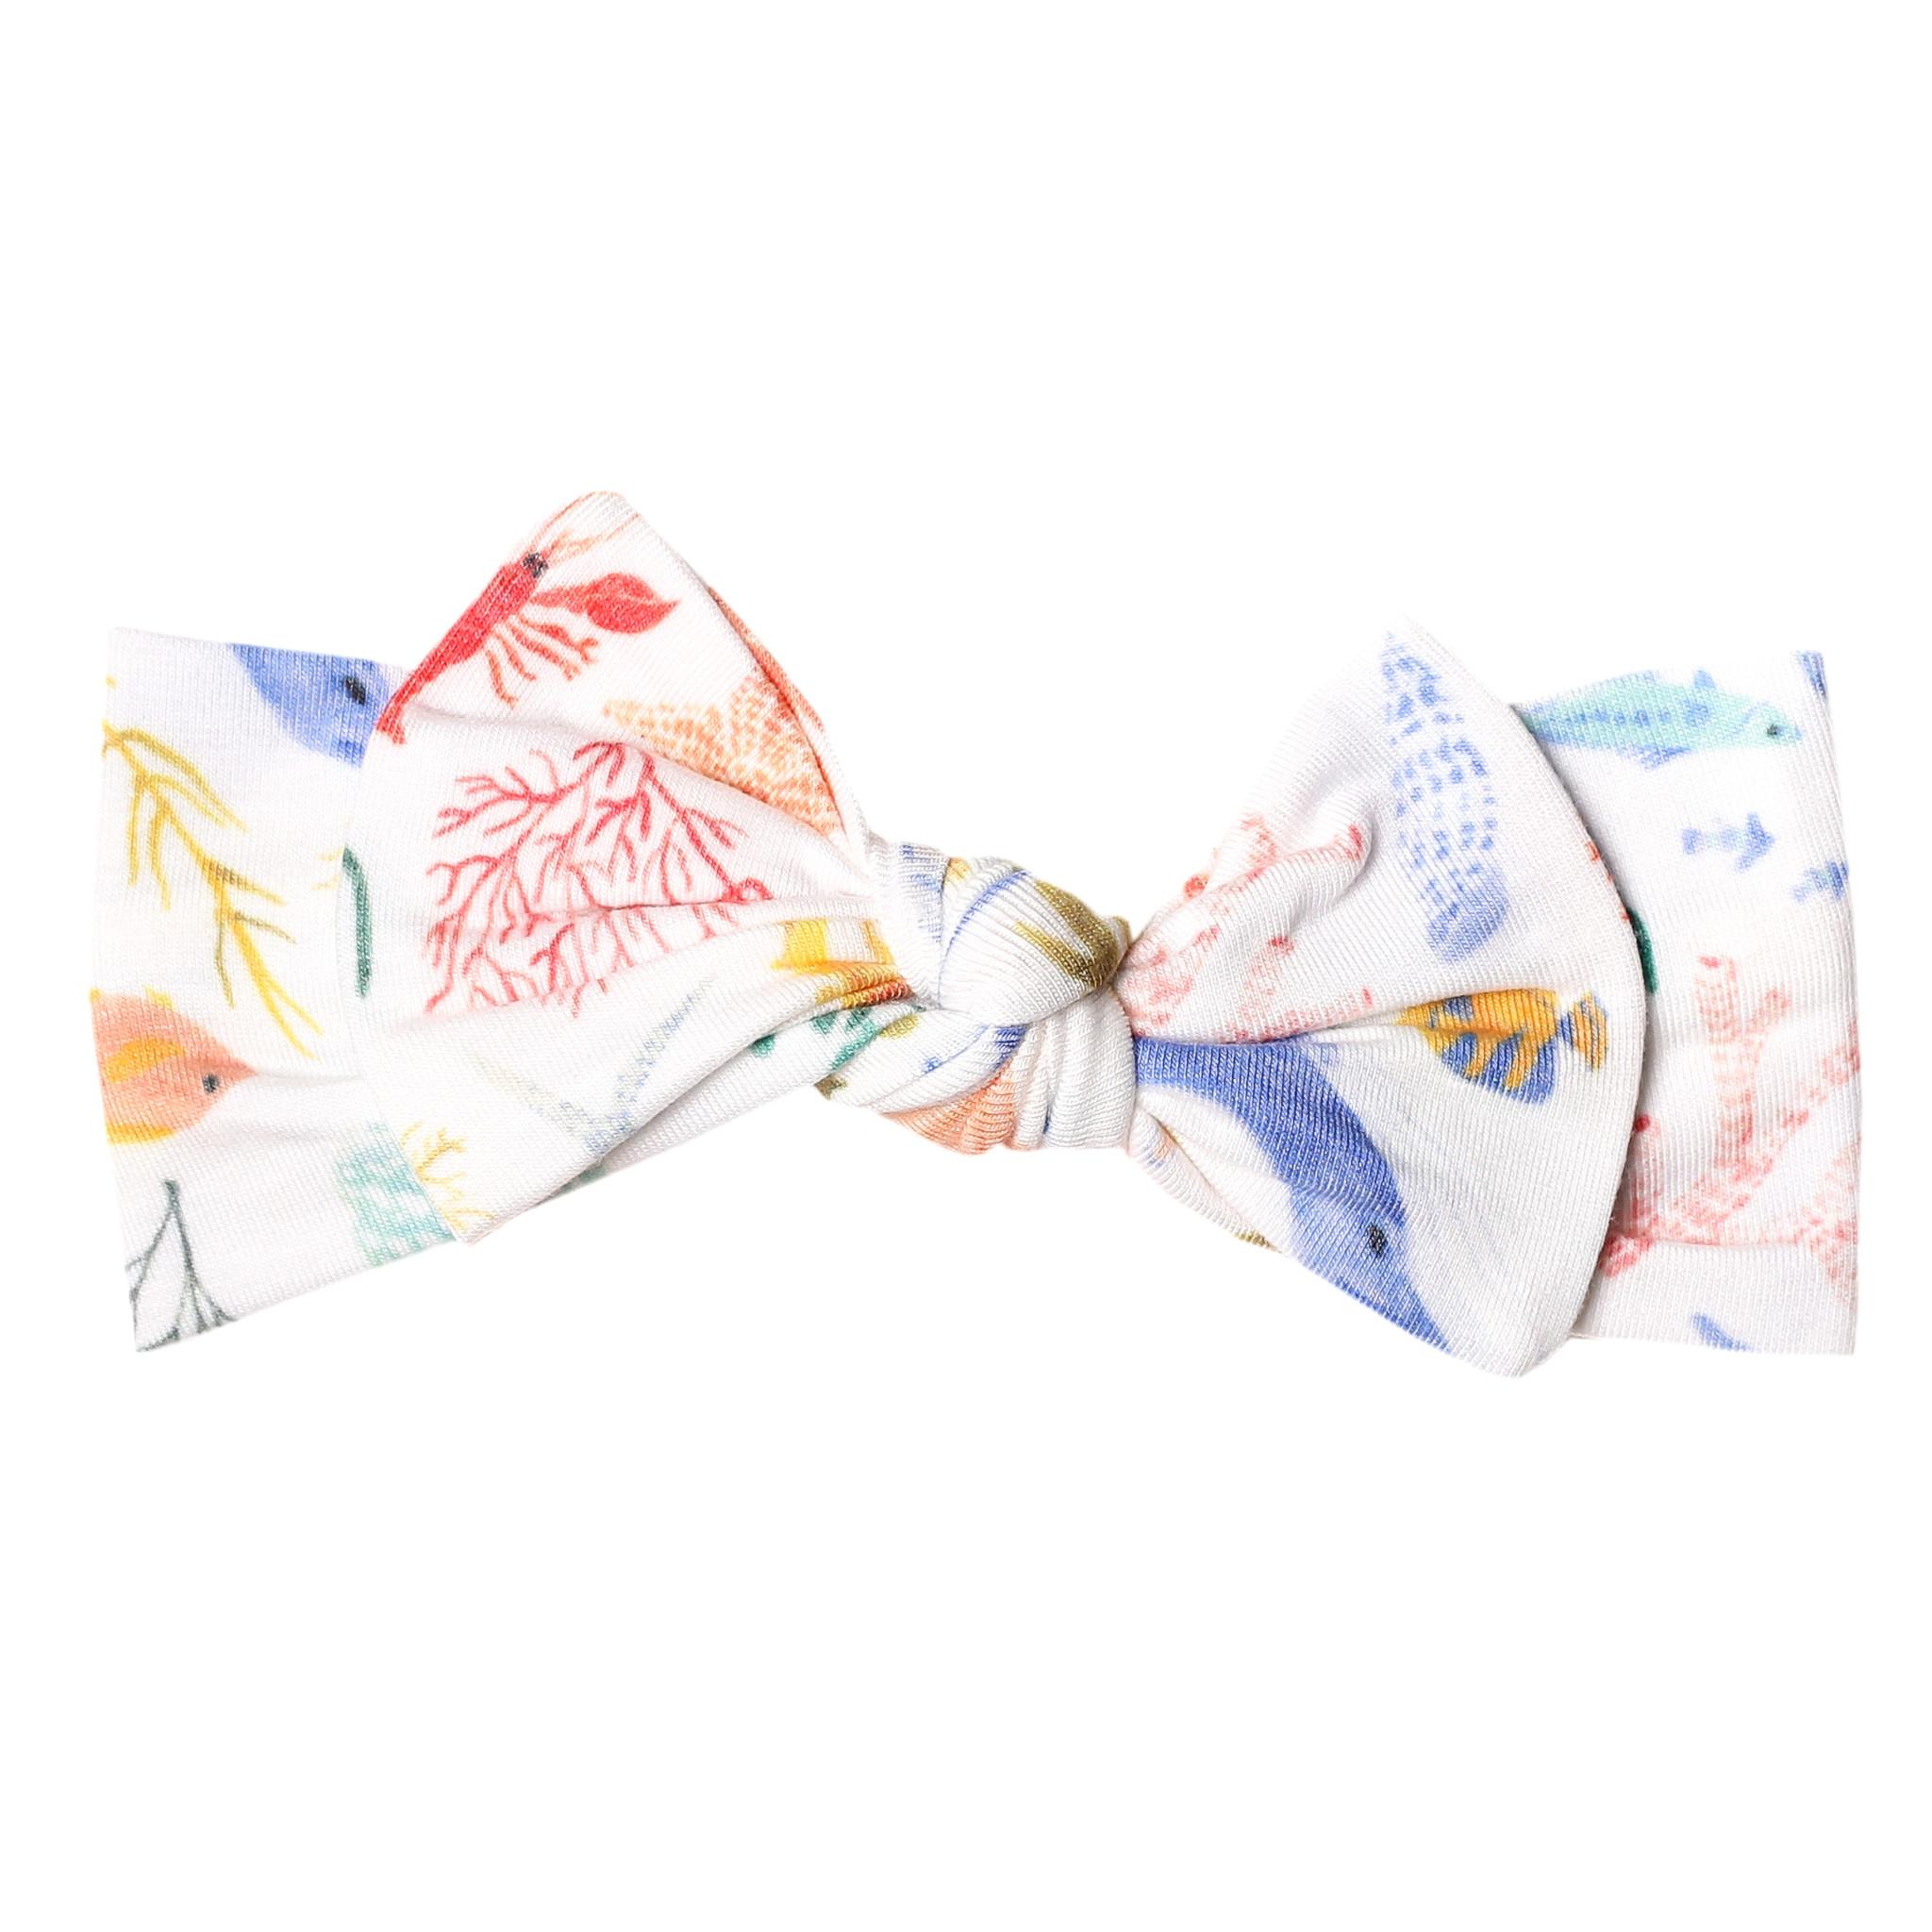 Copper Pearl Knit Headband Nautical